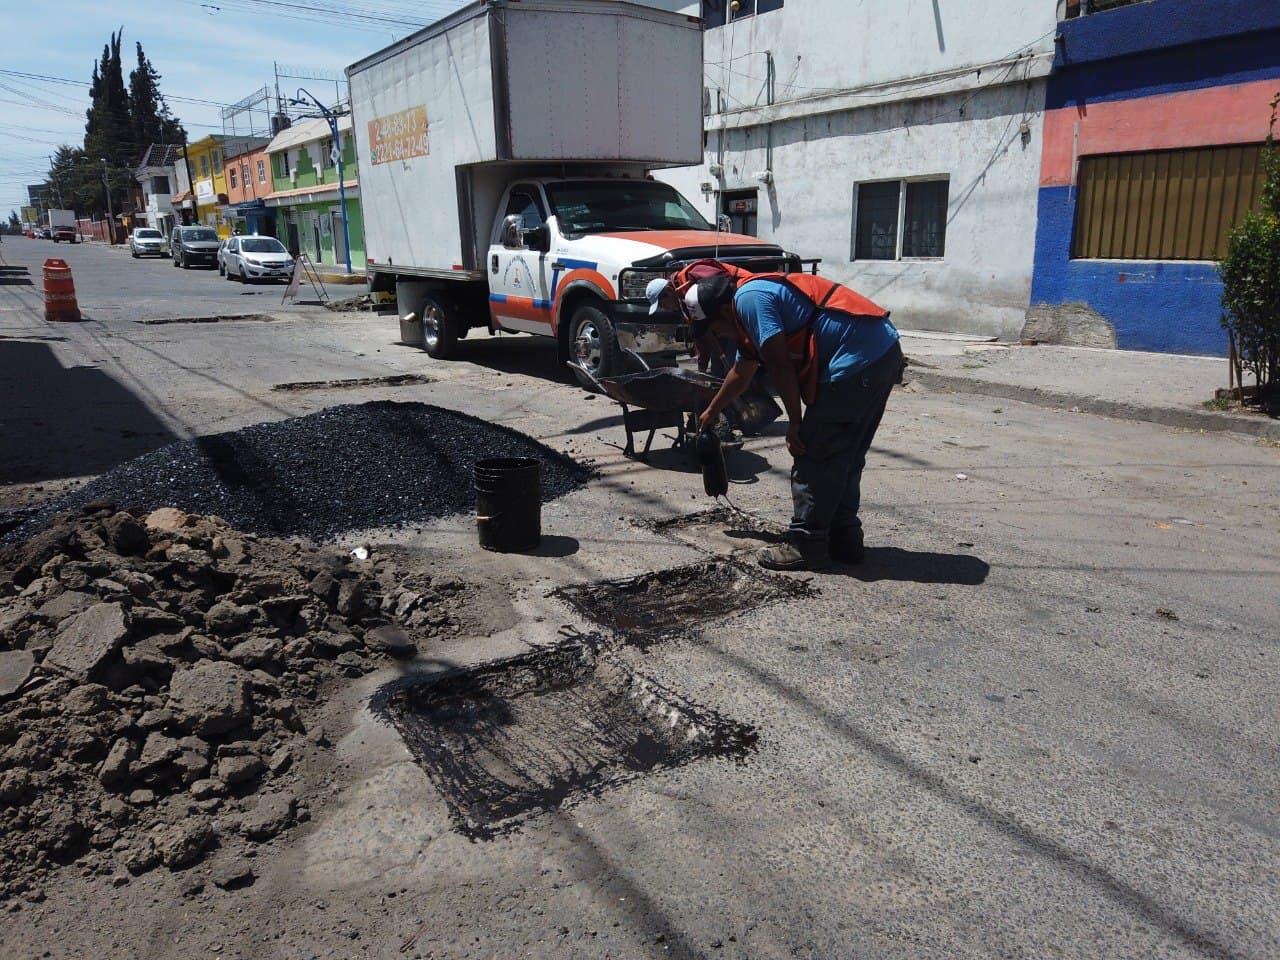 Mala planeación afecta trabajos de bacheo, acusa regidora de Morena